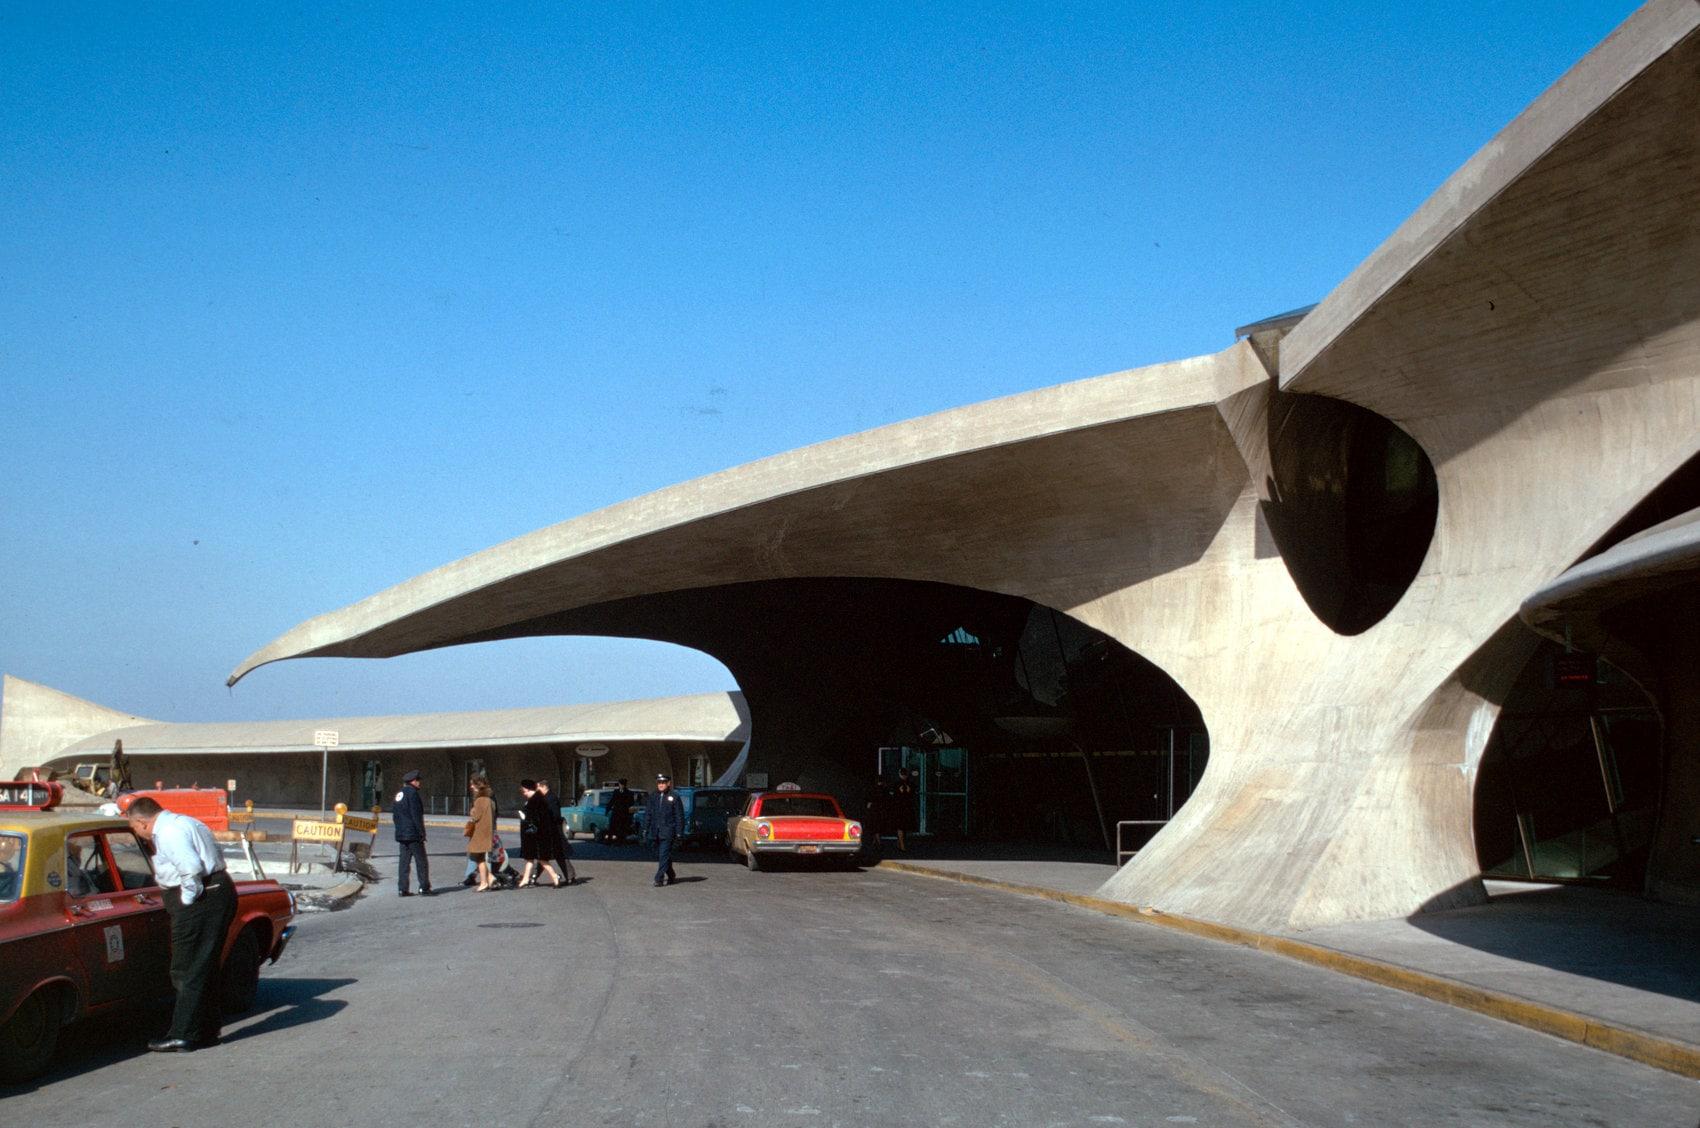 Exterior TWA terminal at Idlewild (John F Kennedy Airport), New York